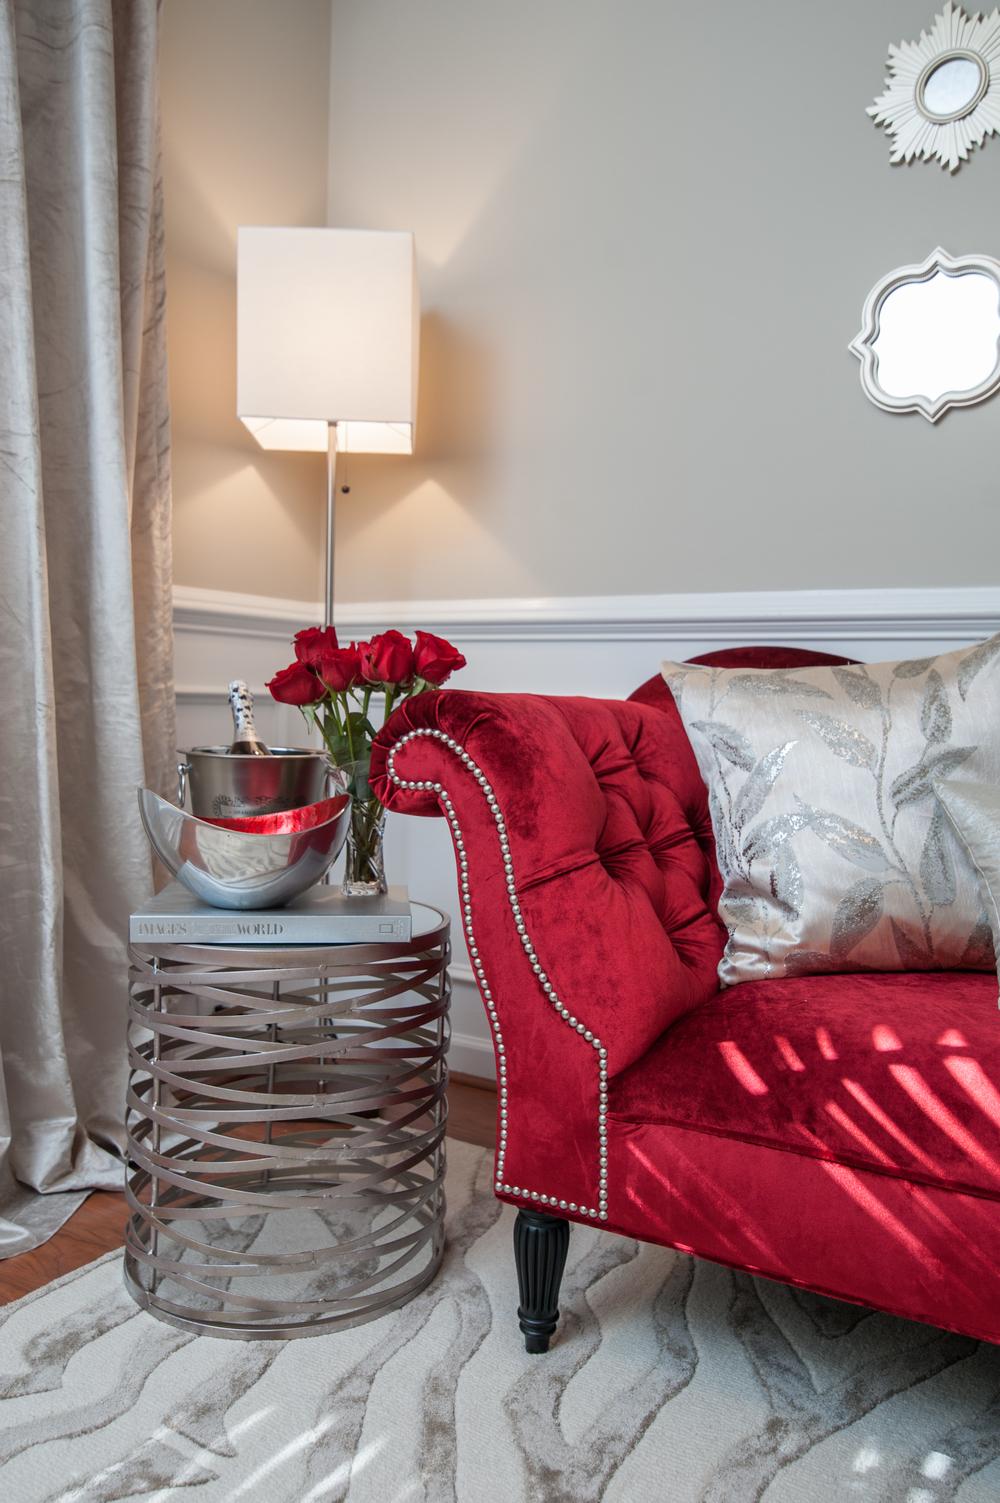 Artful Interiors - Modern Office - Chaise Lounge